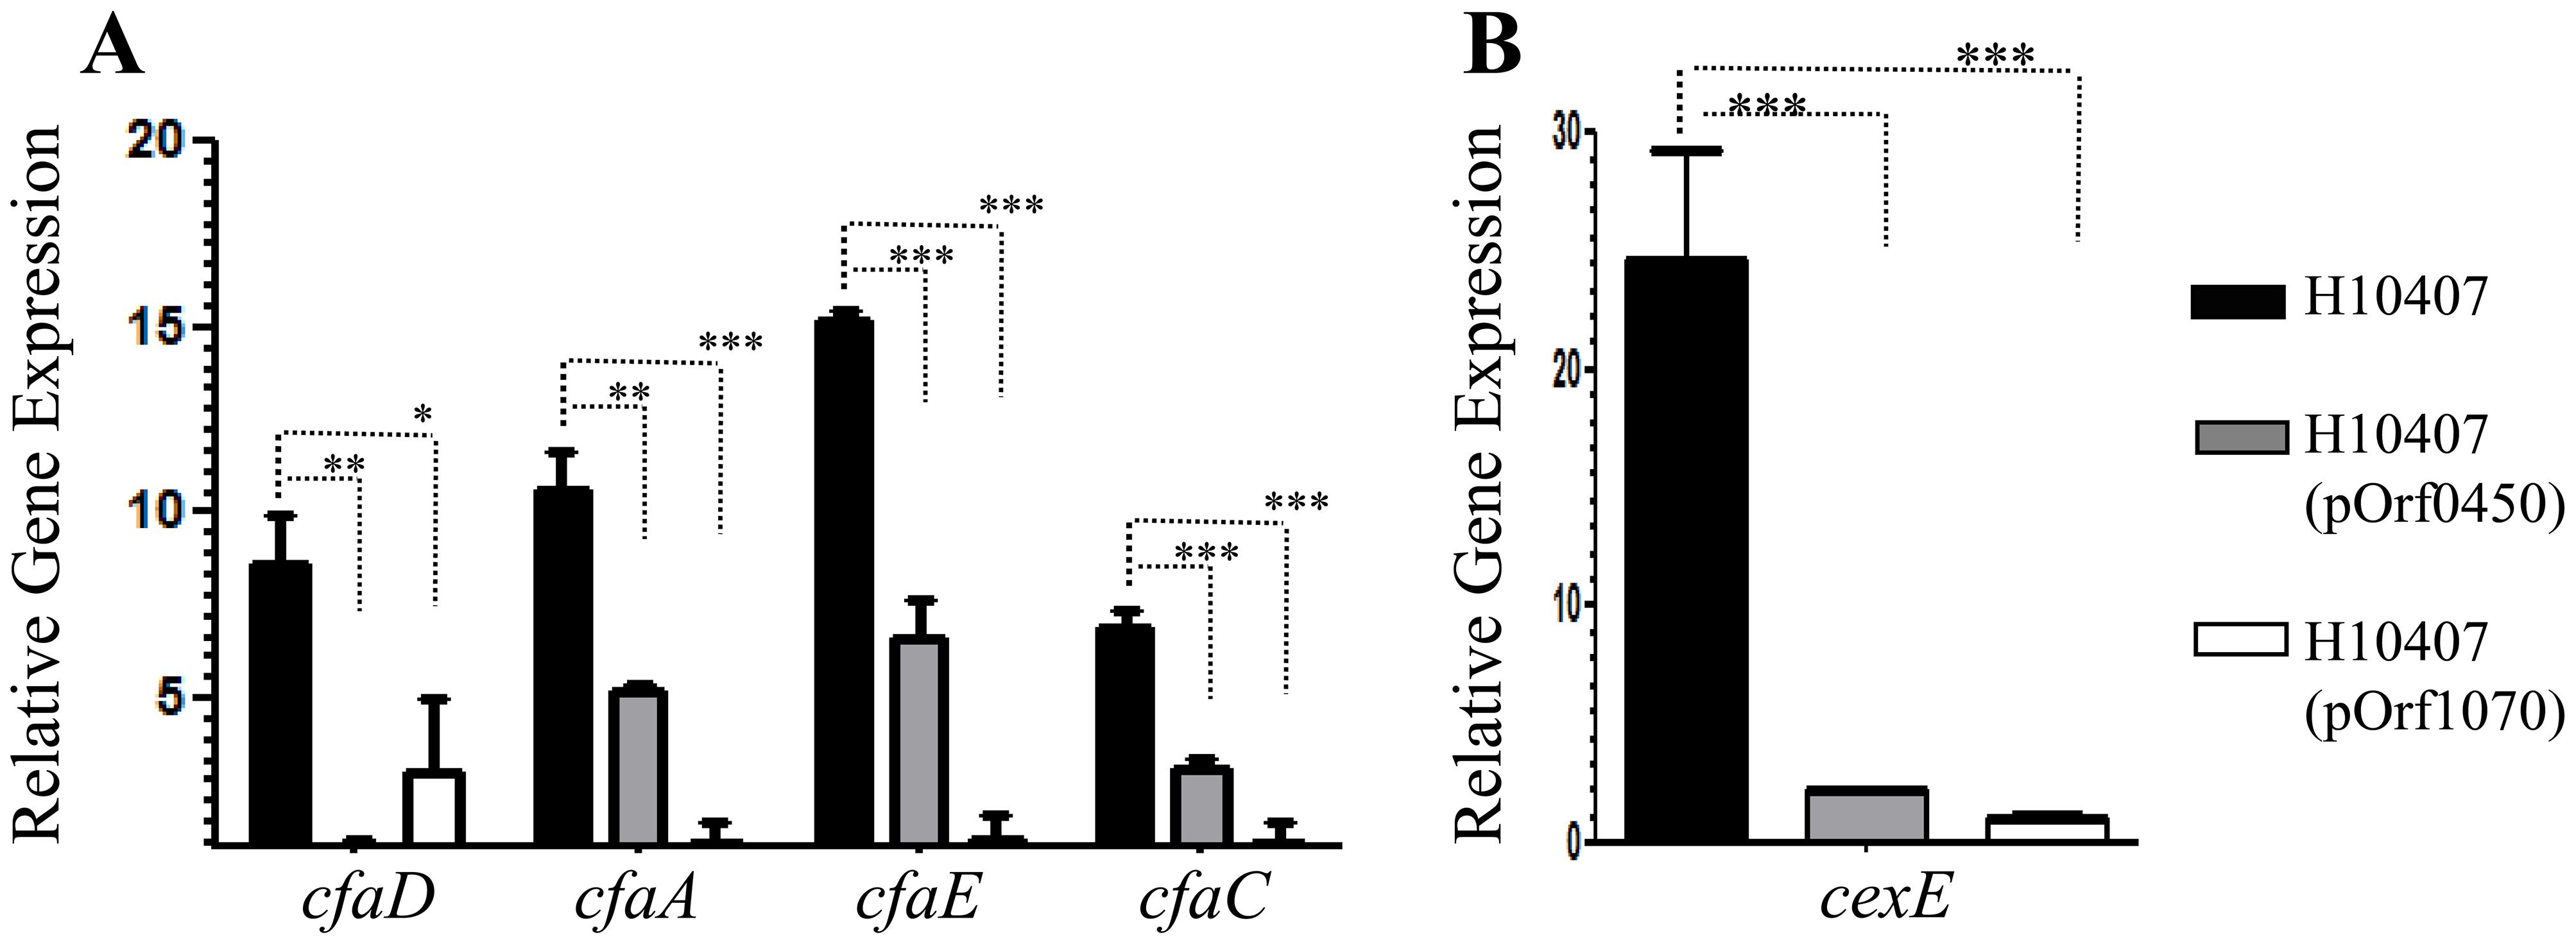 Repression of <i>cfaD/rns</i> and its regulon by ETEC-orf60 homologs.